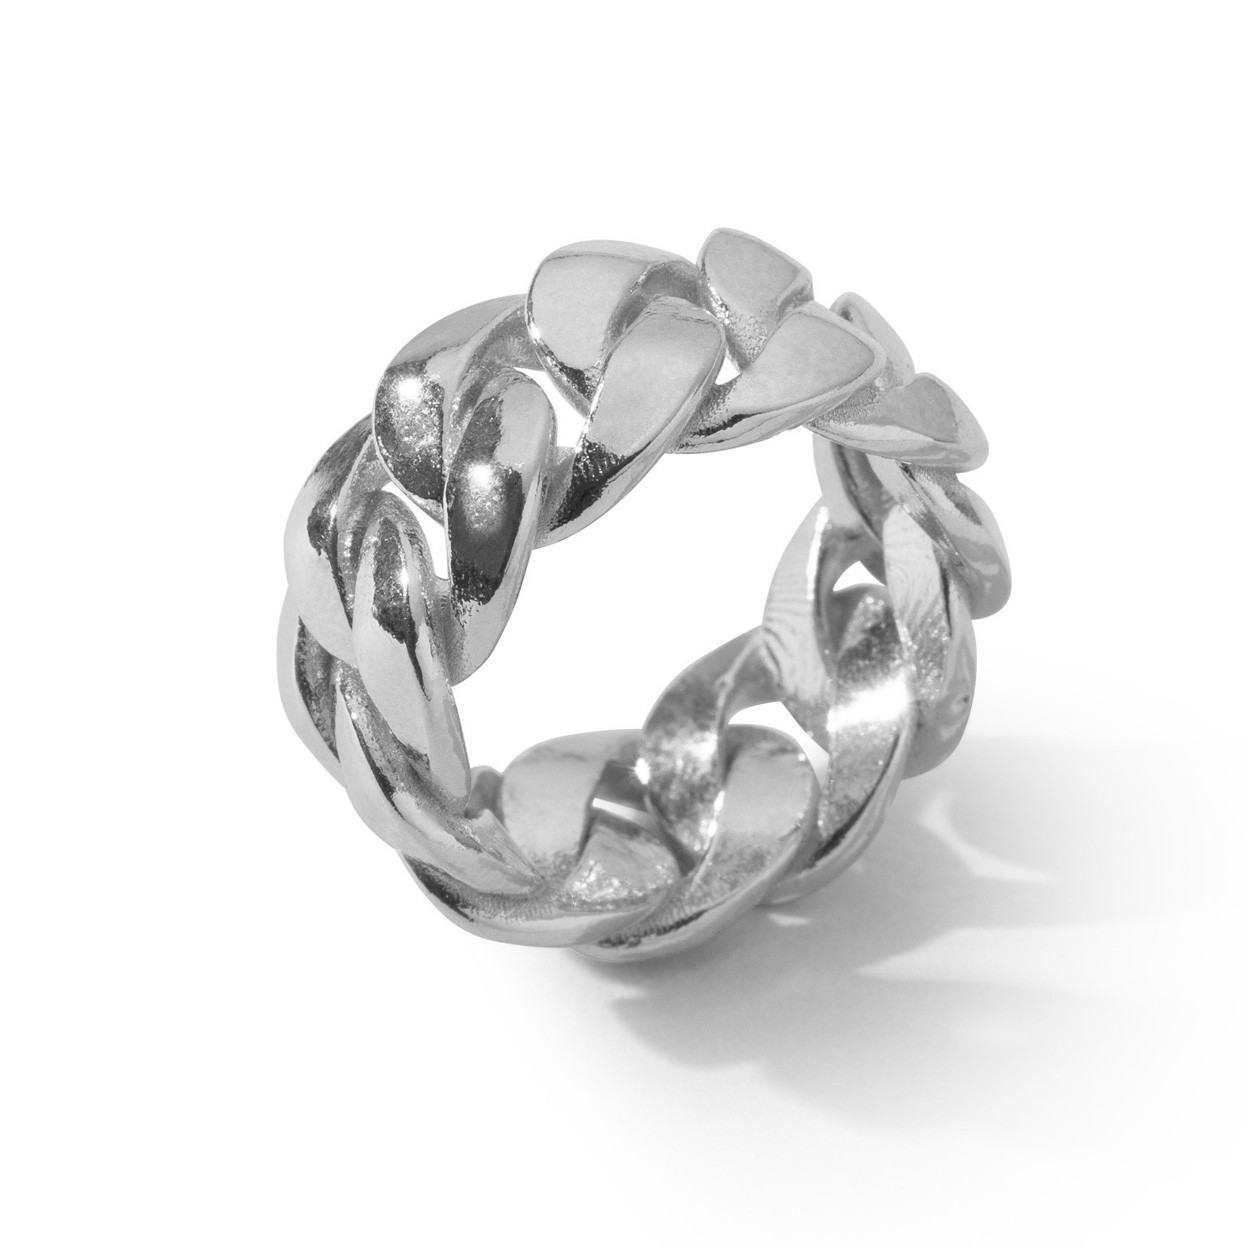 Szeroki pierścionek splot pancerka, srebro 925